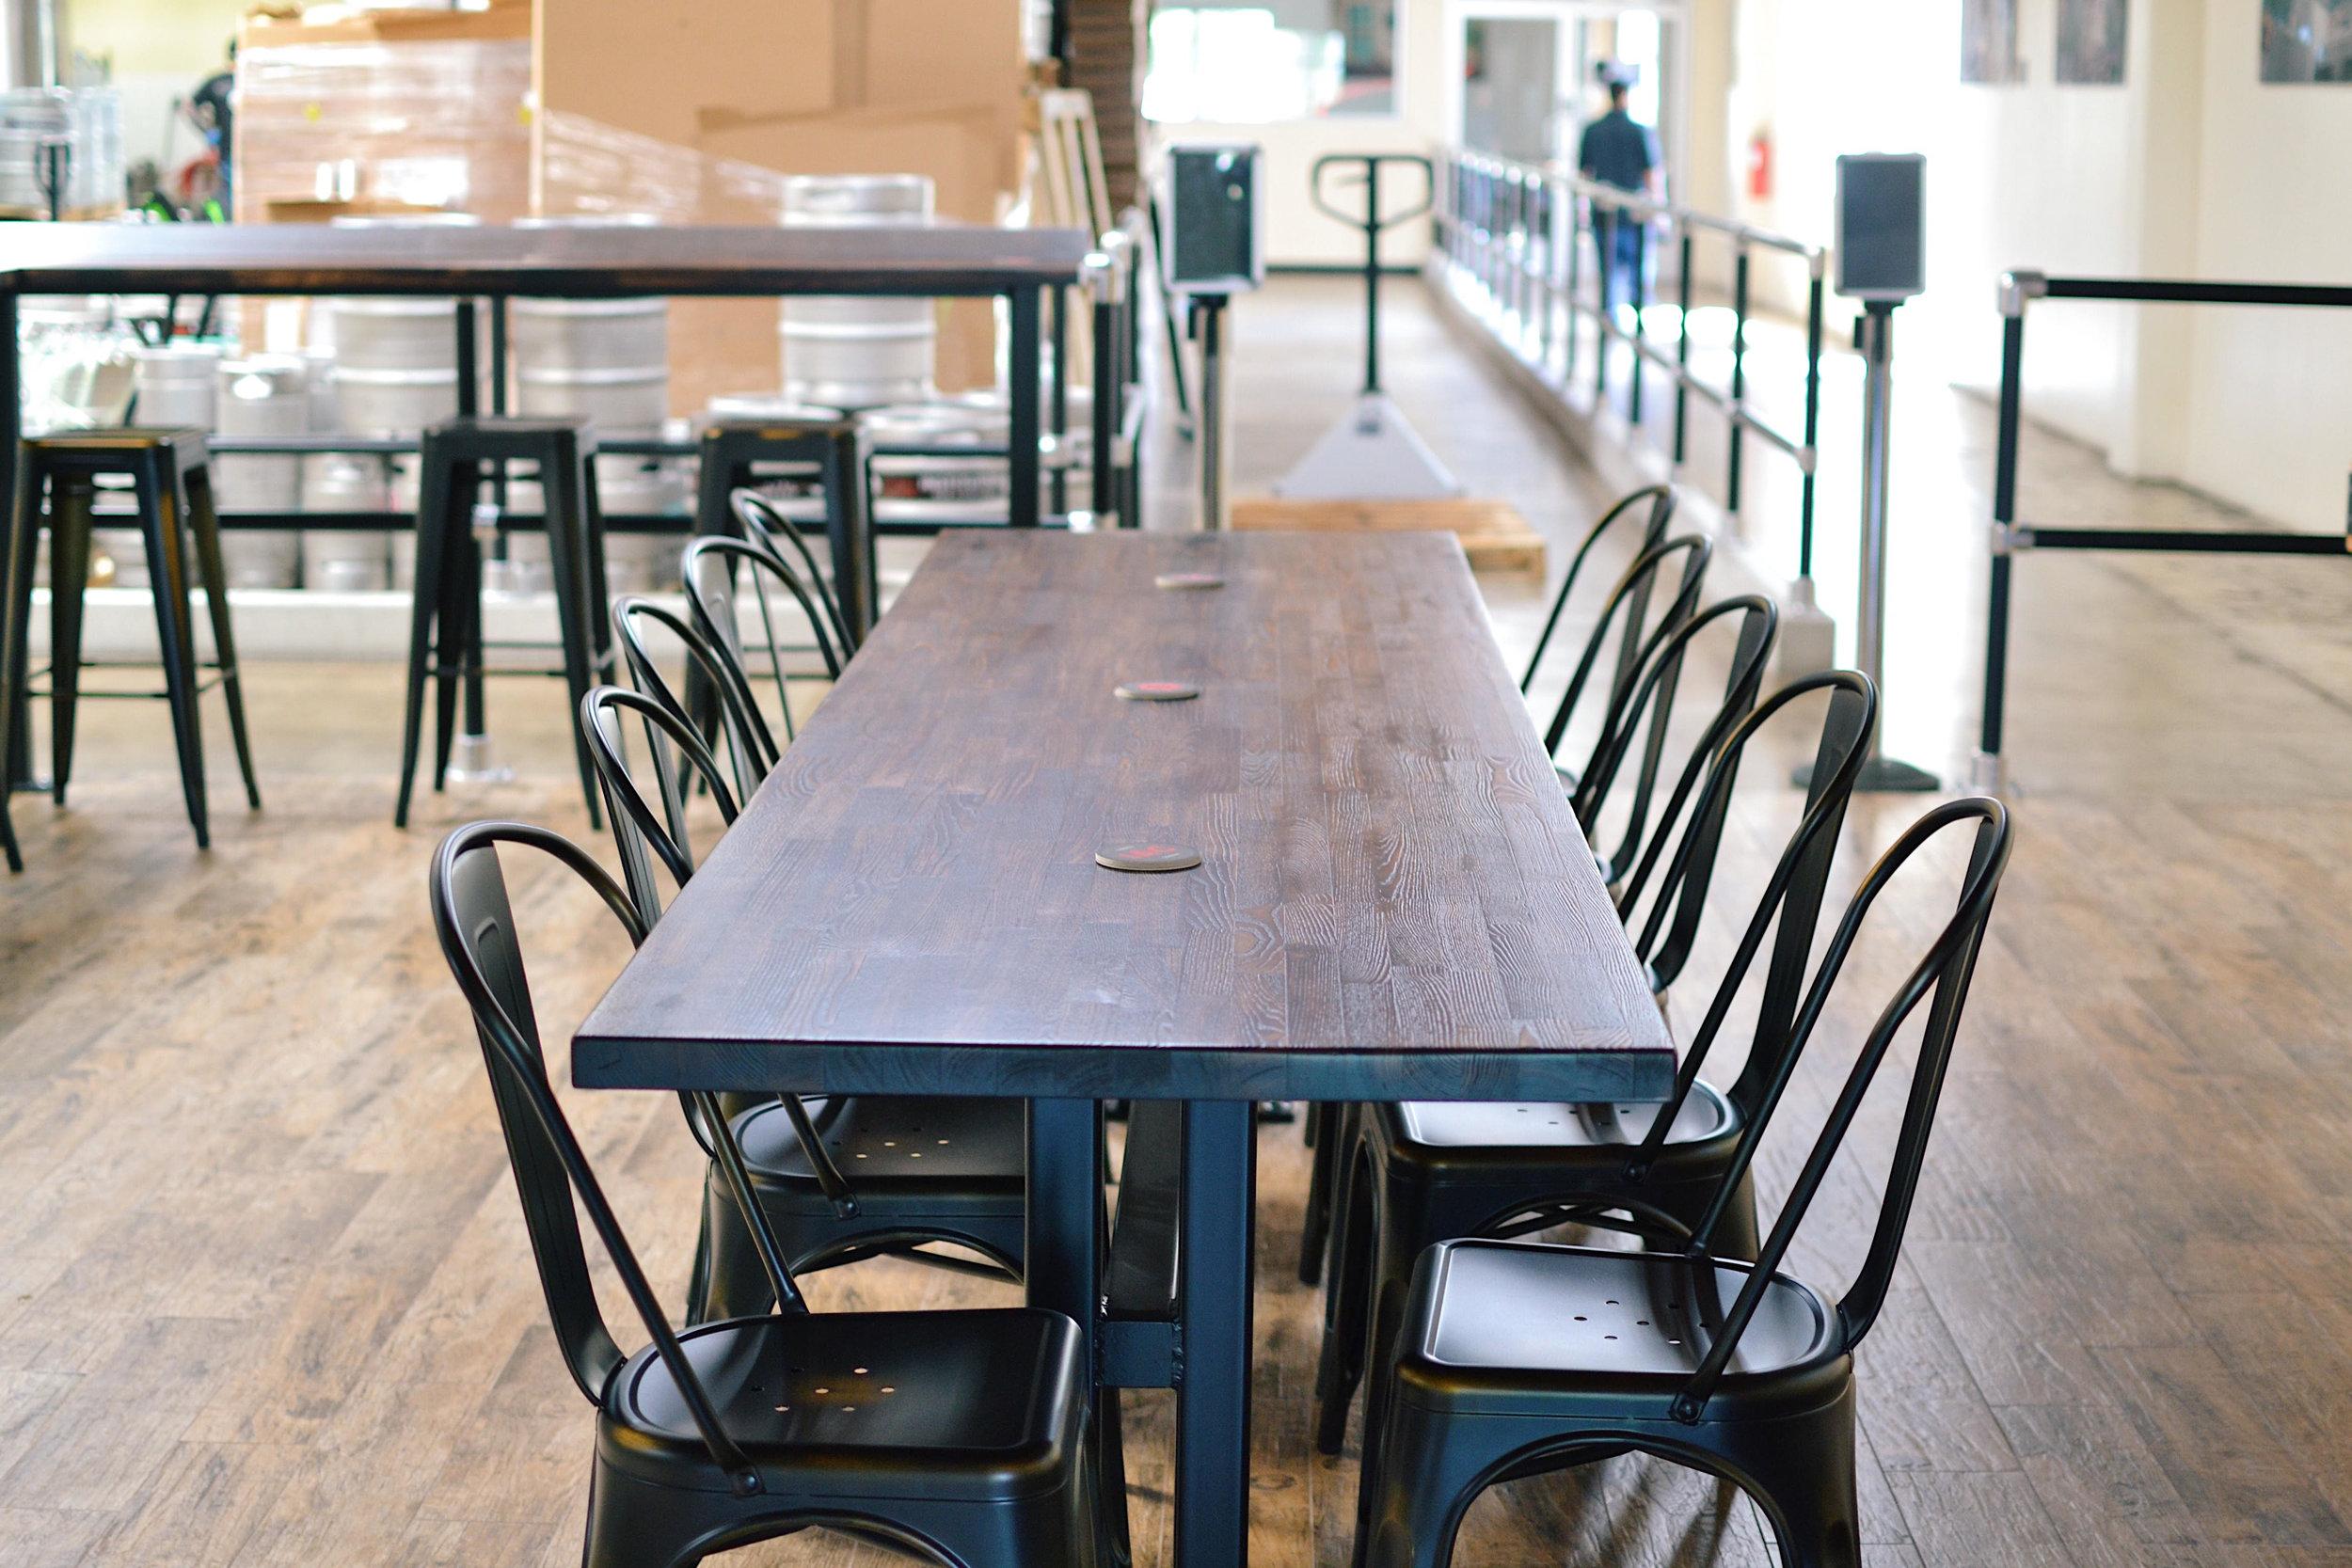 table in game room.jpg